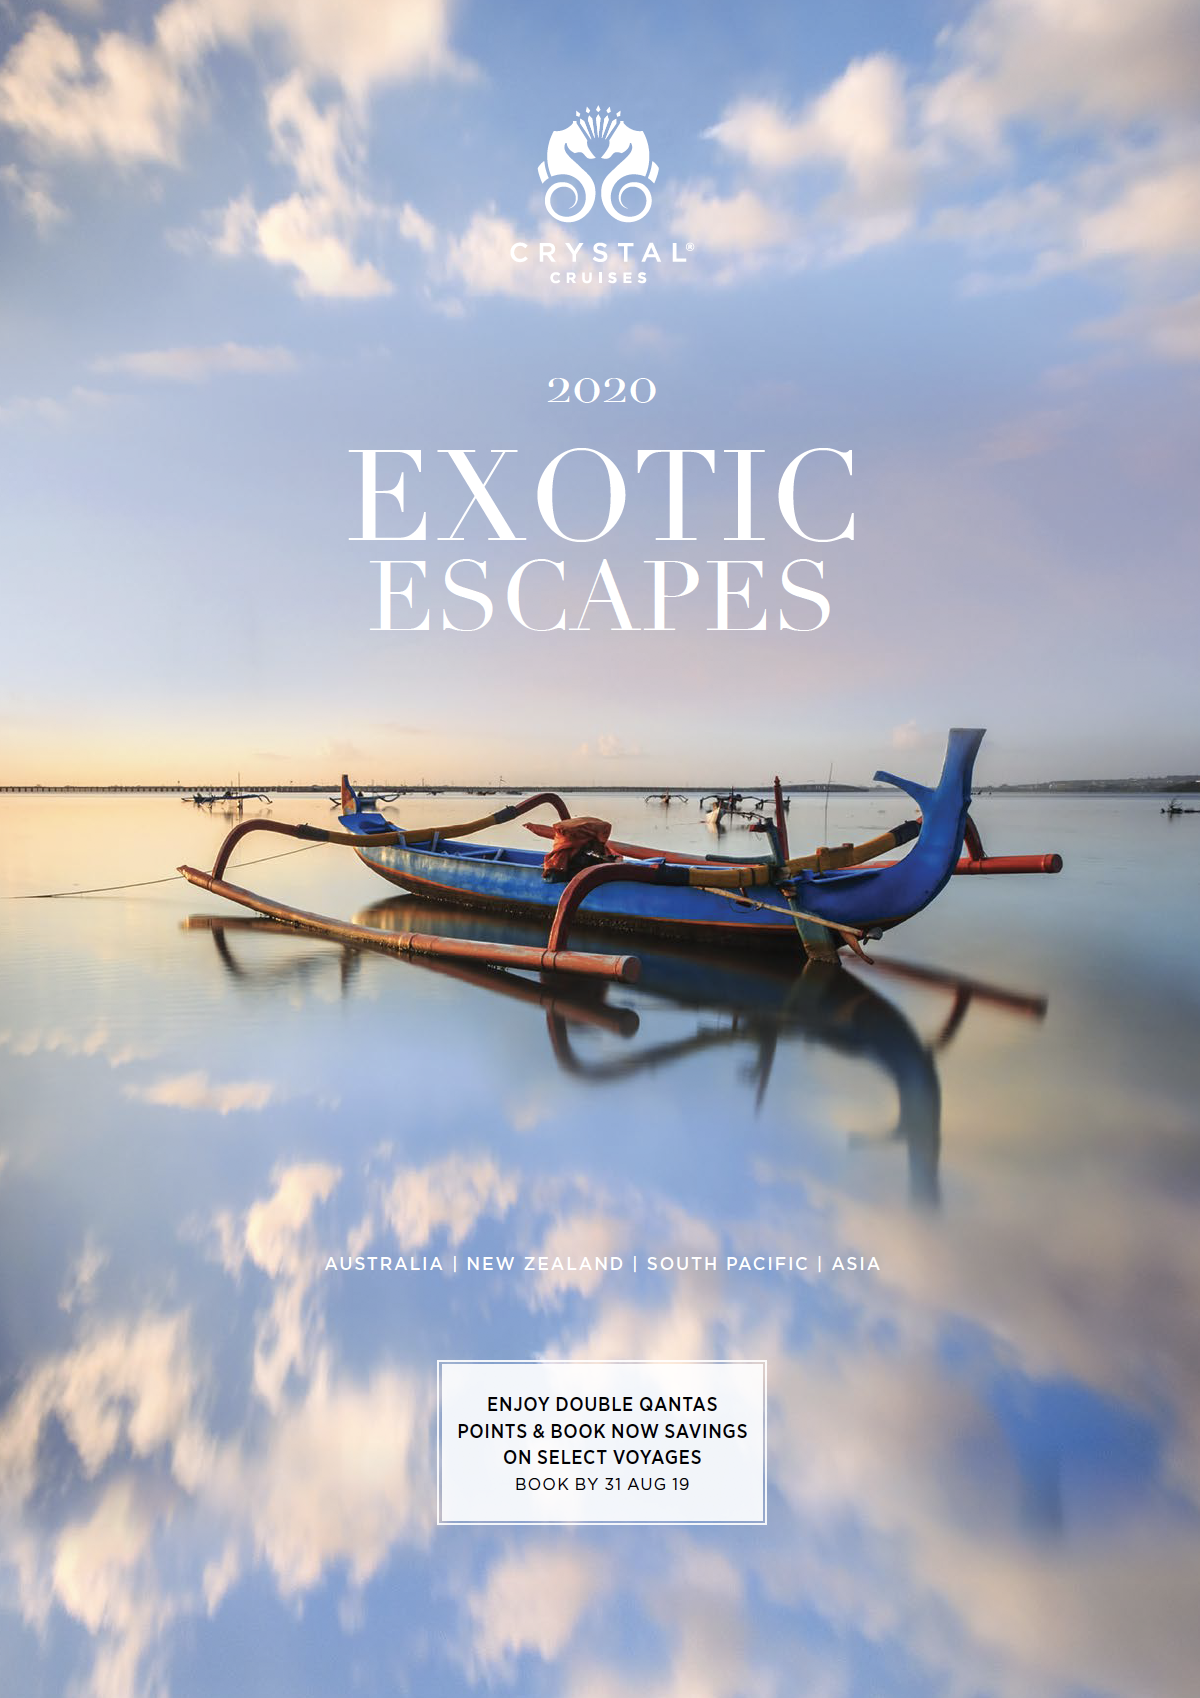 Enjoy double qantas points + savings - Download brochure here